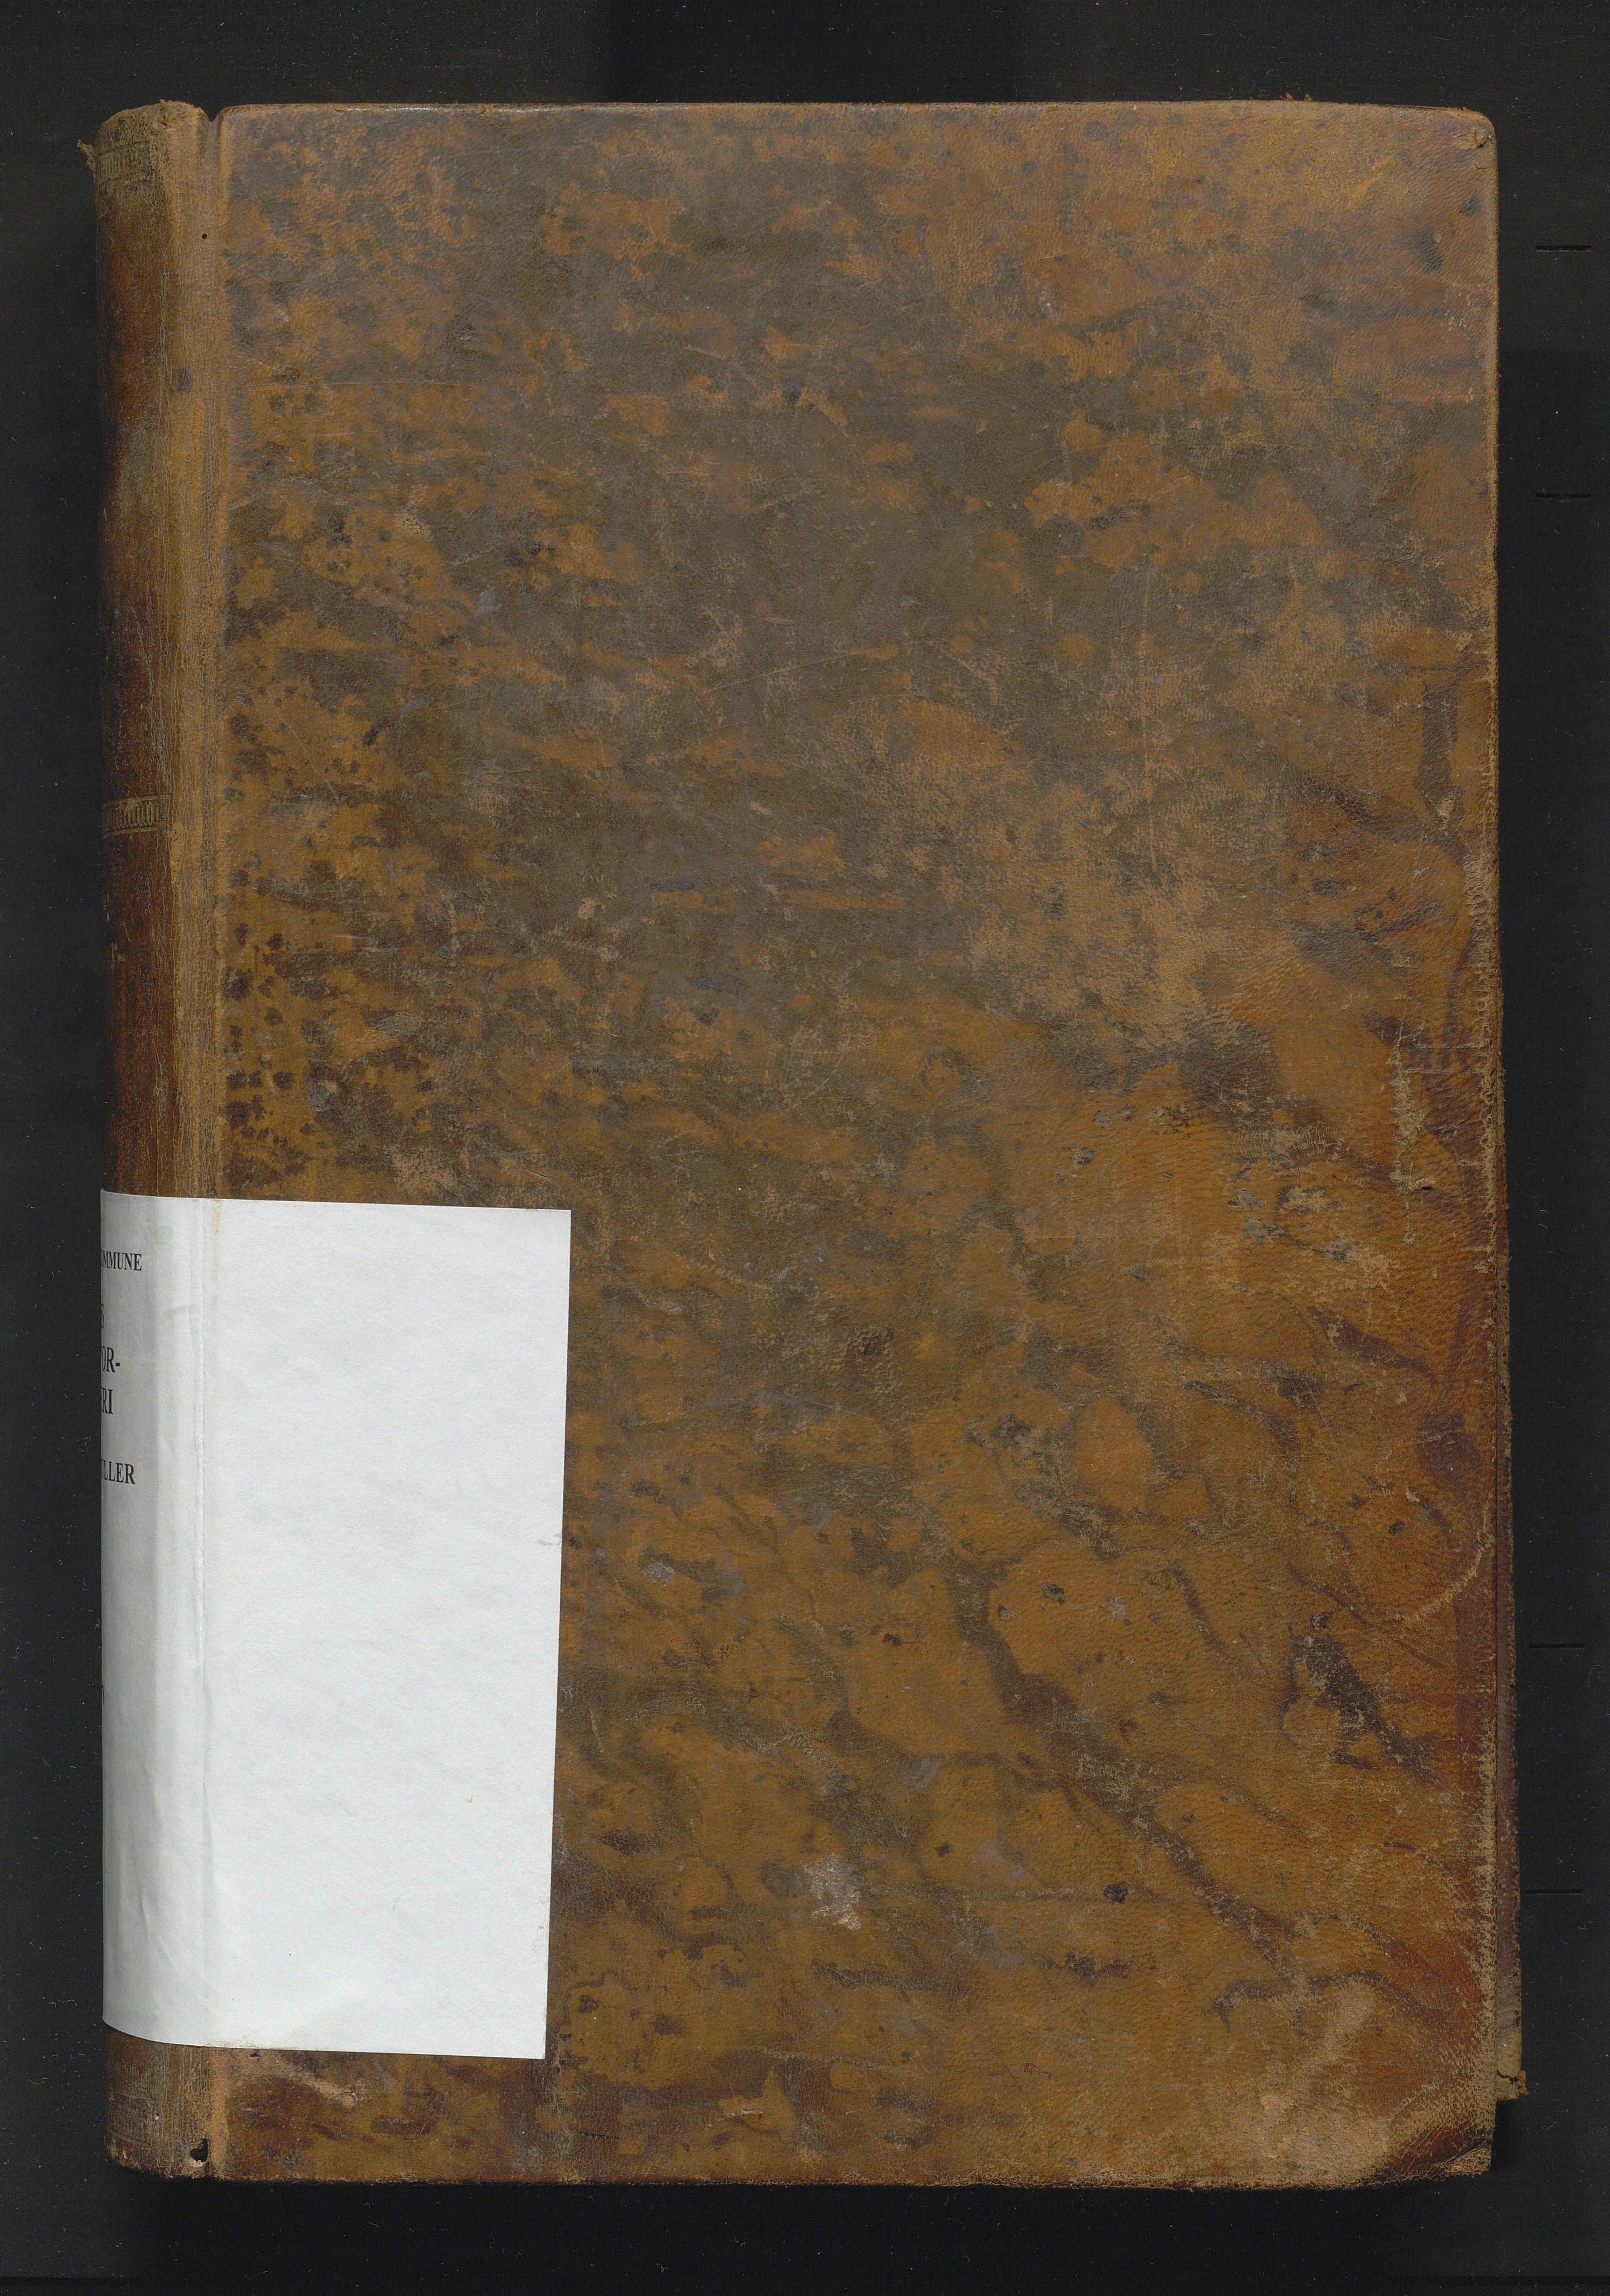 IKAH, Tysnes kommune. Overformynderiet, F/Fab/L0001: Stor overformyndarrulle, 1859-1878